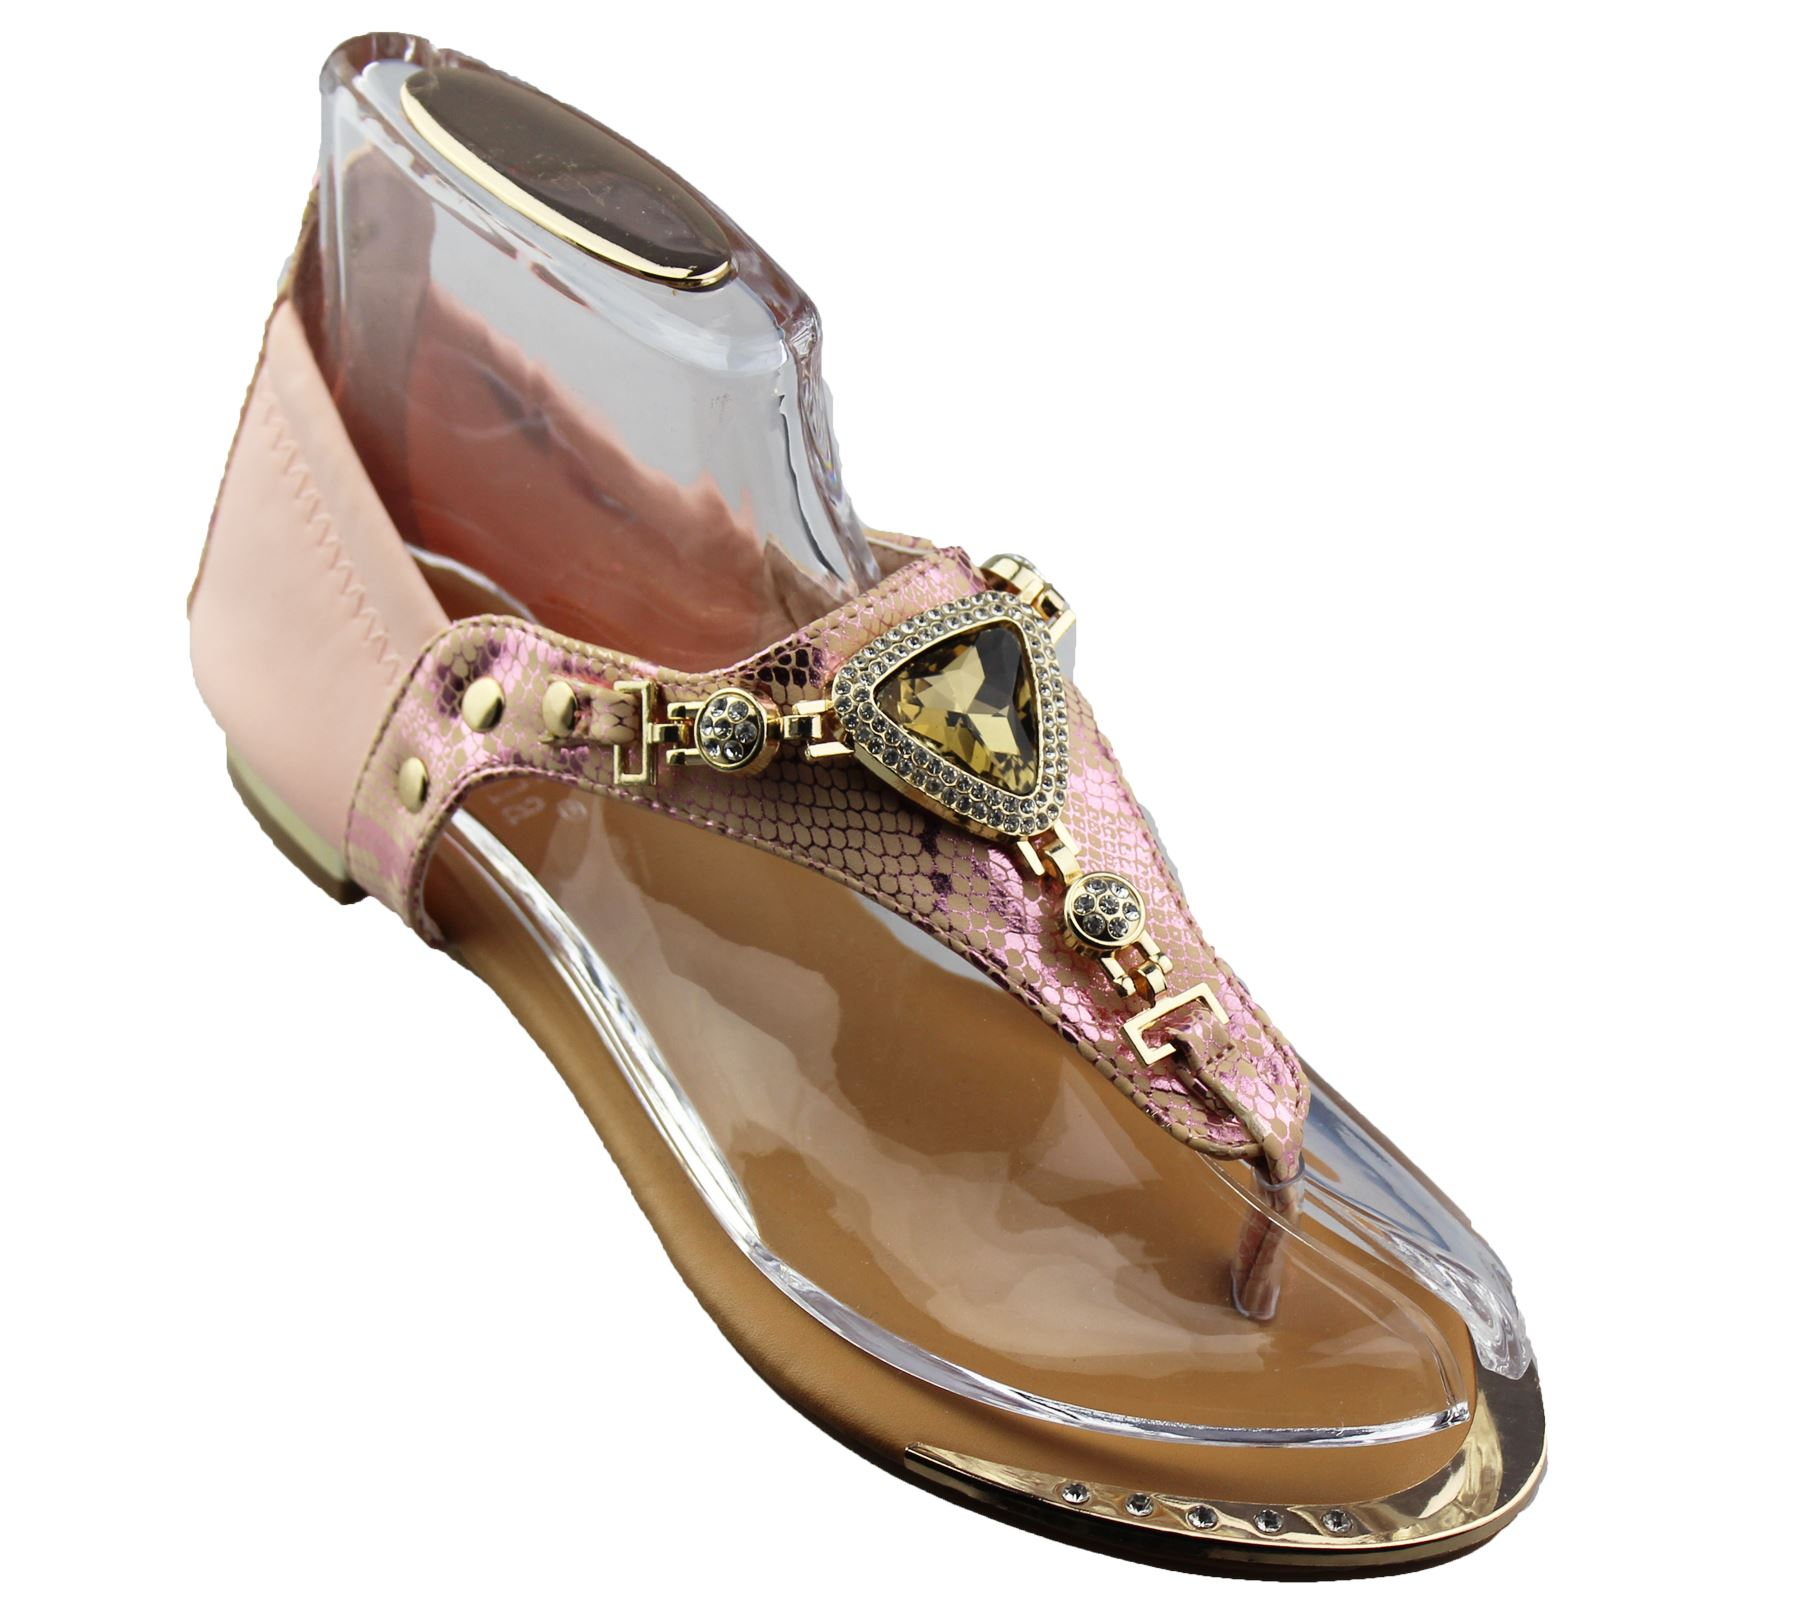 Womens-Flat-Summer-Sandals-Ladies-Diamante-Wedding-Toe-Post-Casual-Slipper thumbnail 33